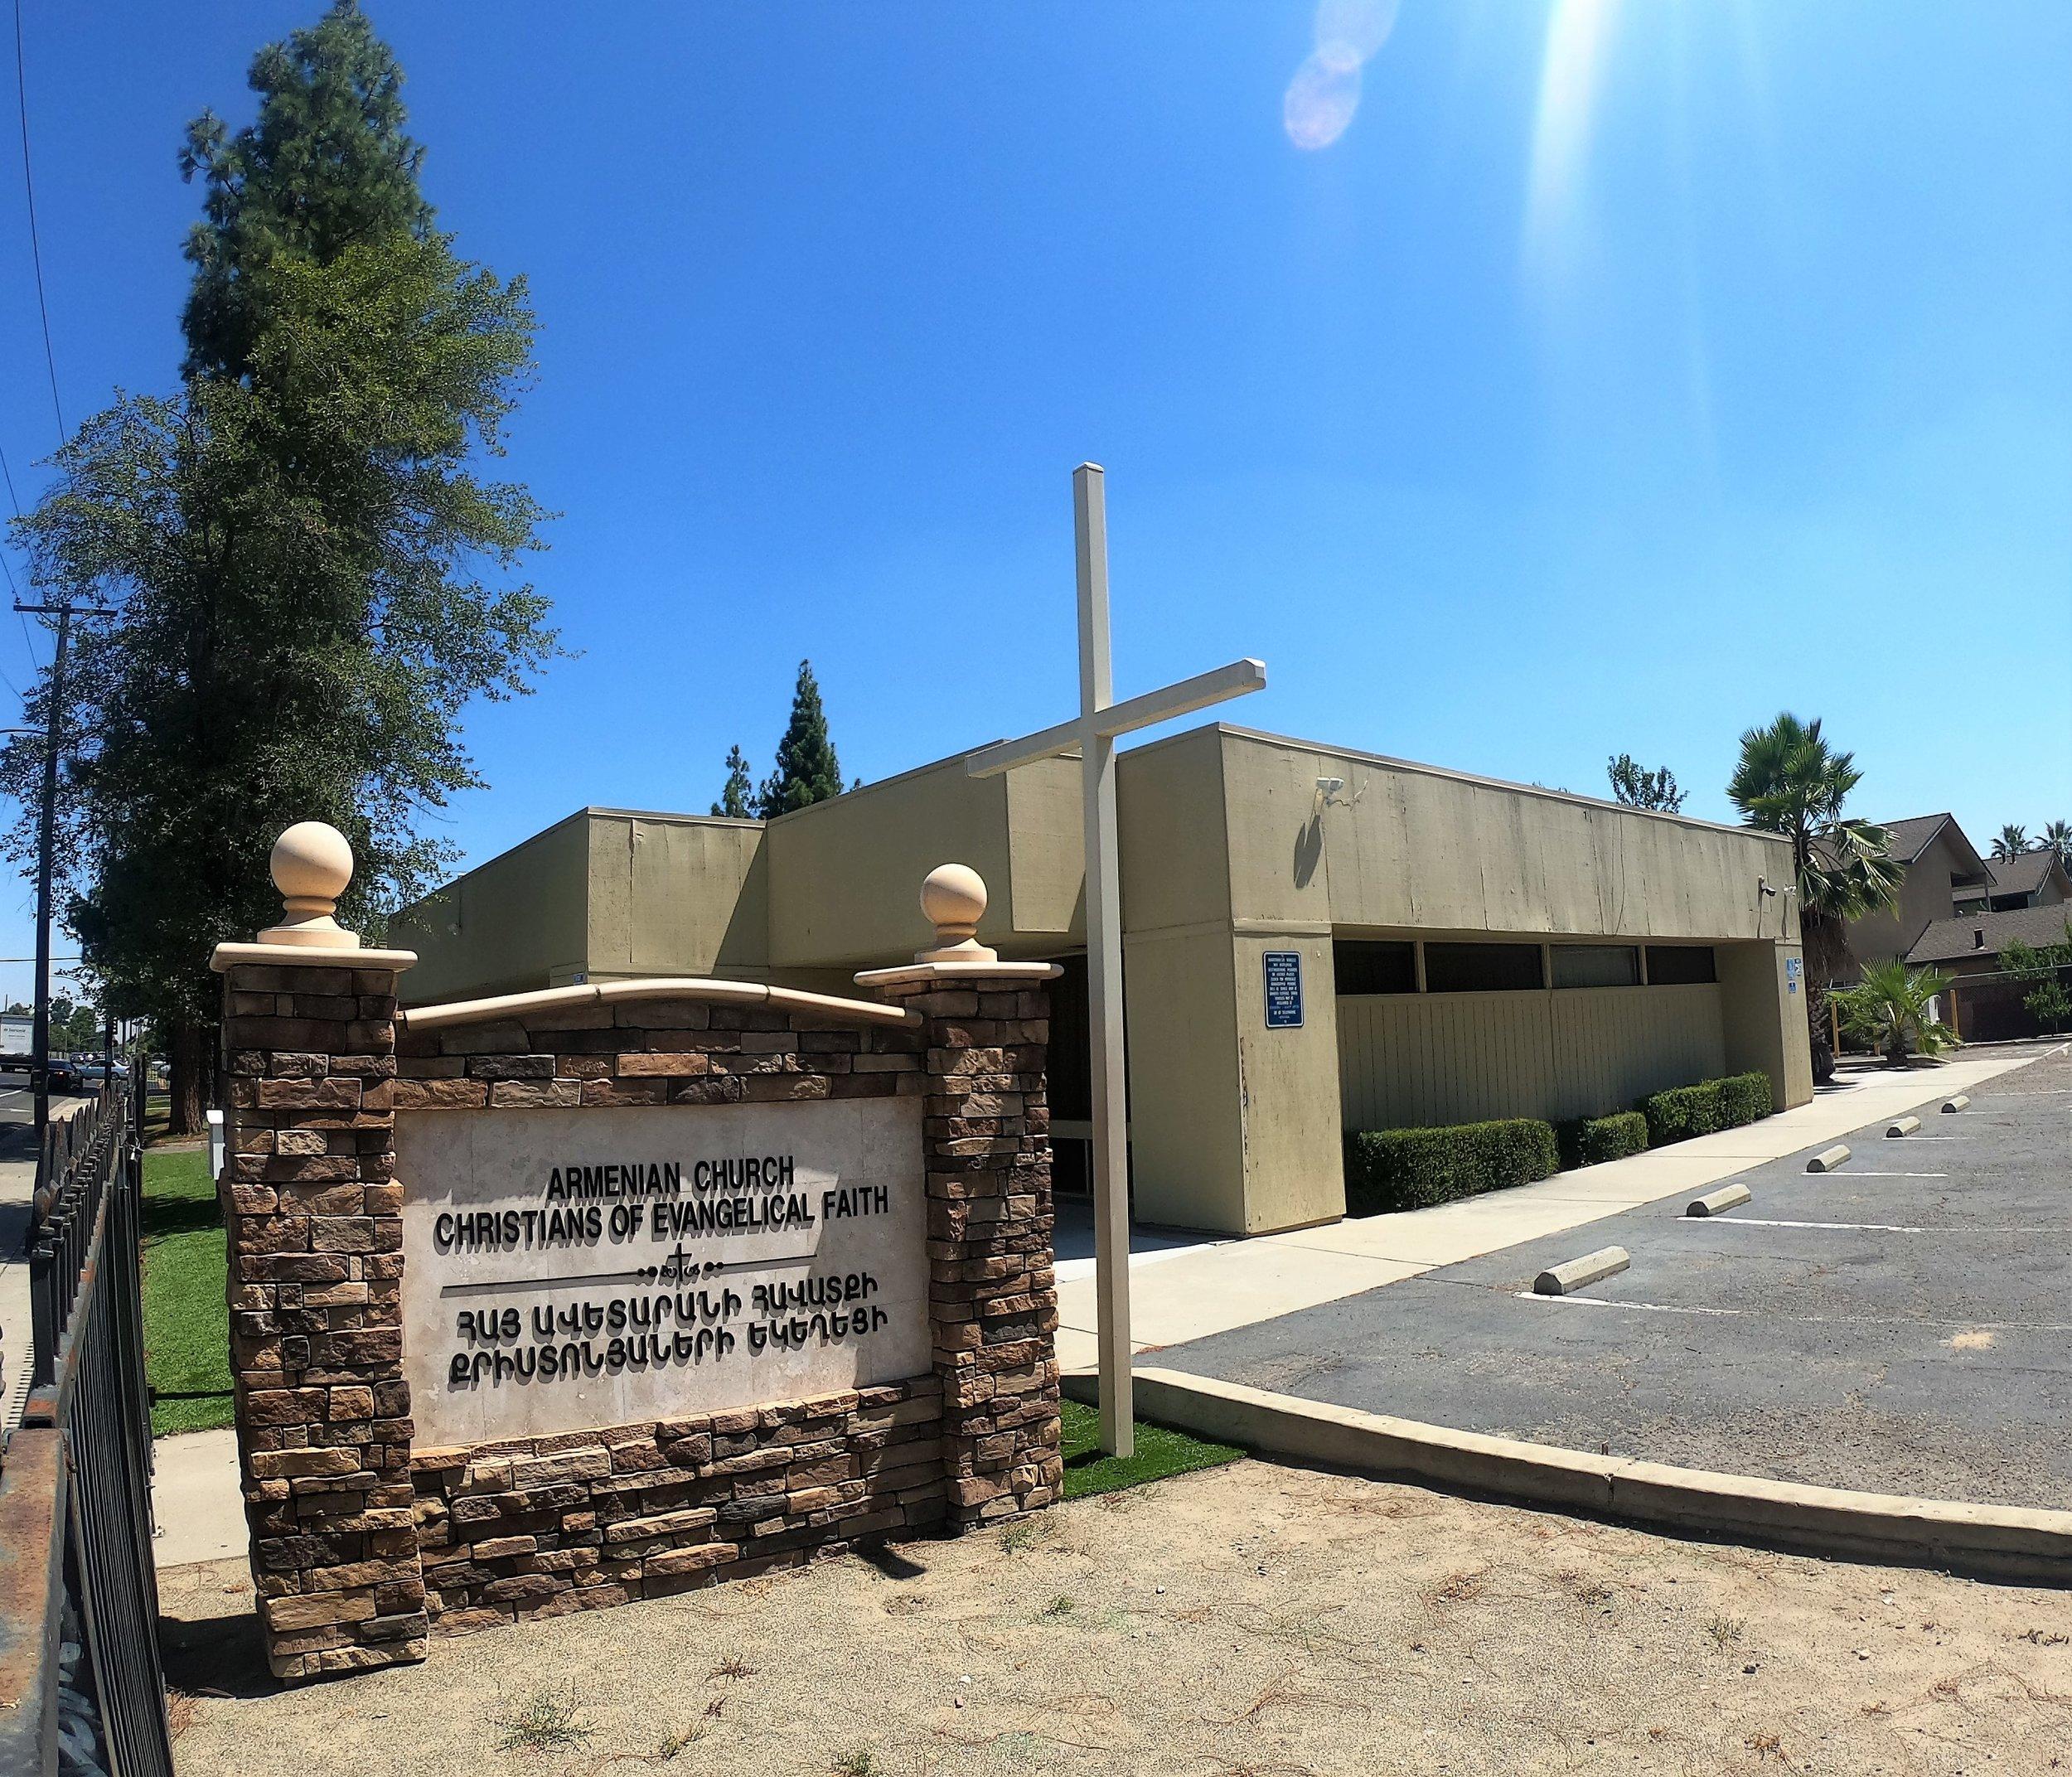 Armenian Church of Christian Evangelical Faith in Fresno, California